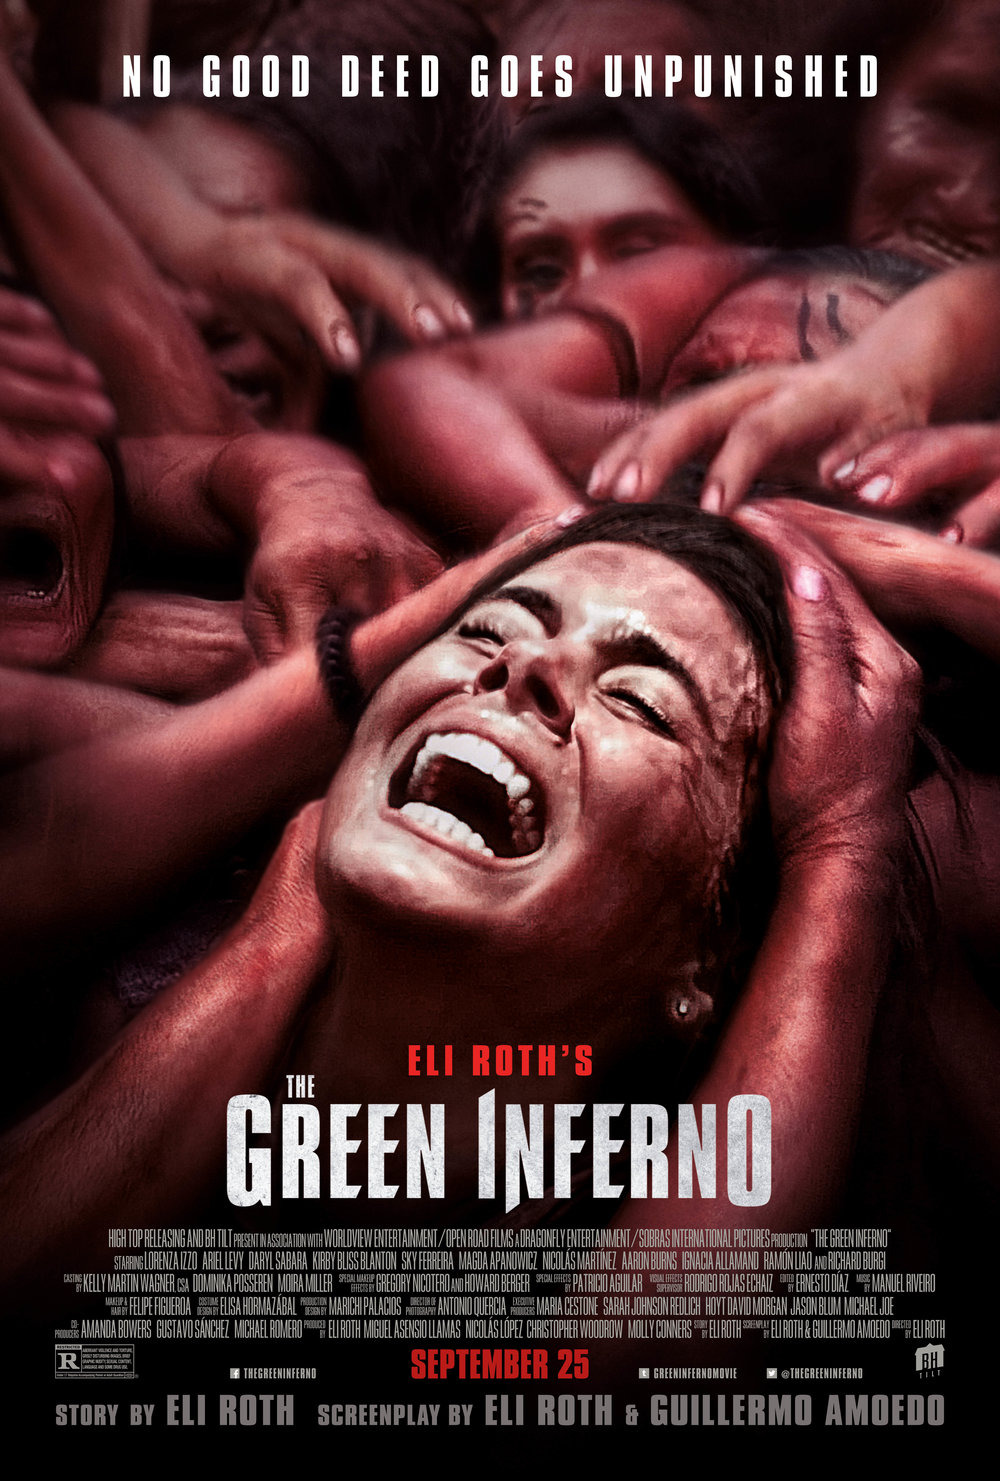 GreenInferno_Dom_Payoff_1sht_R1.jpg